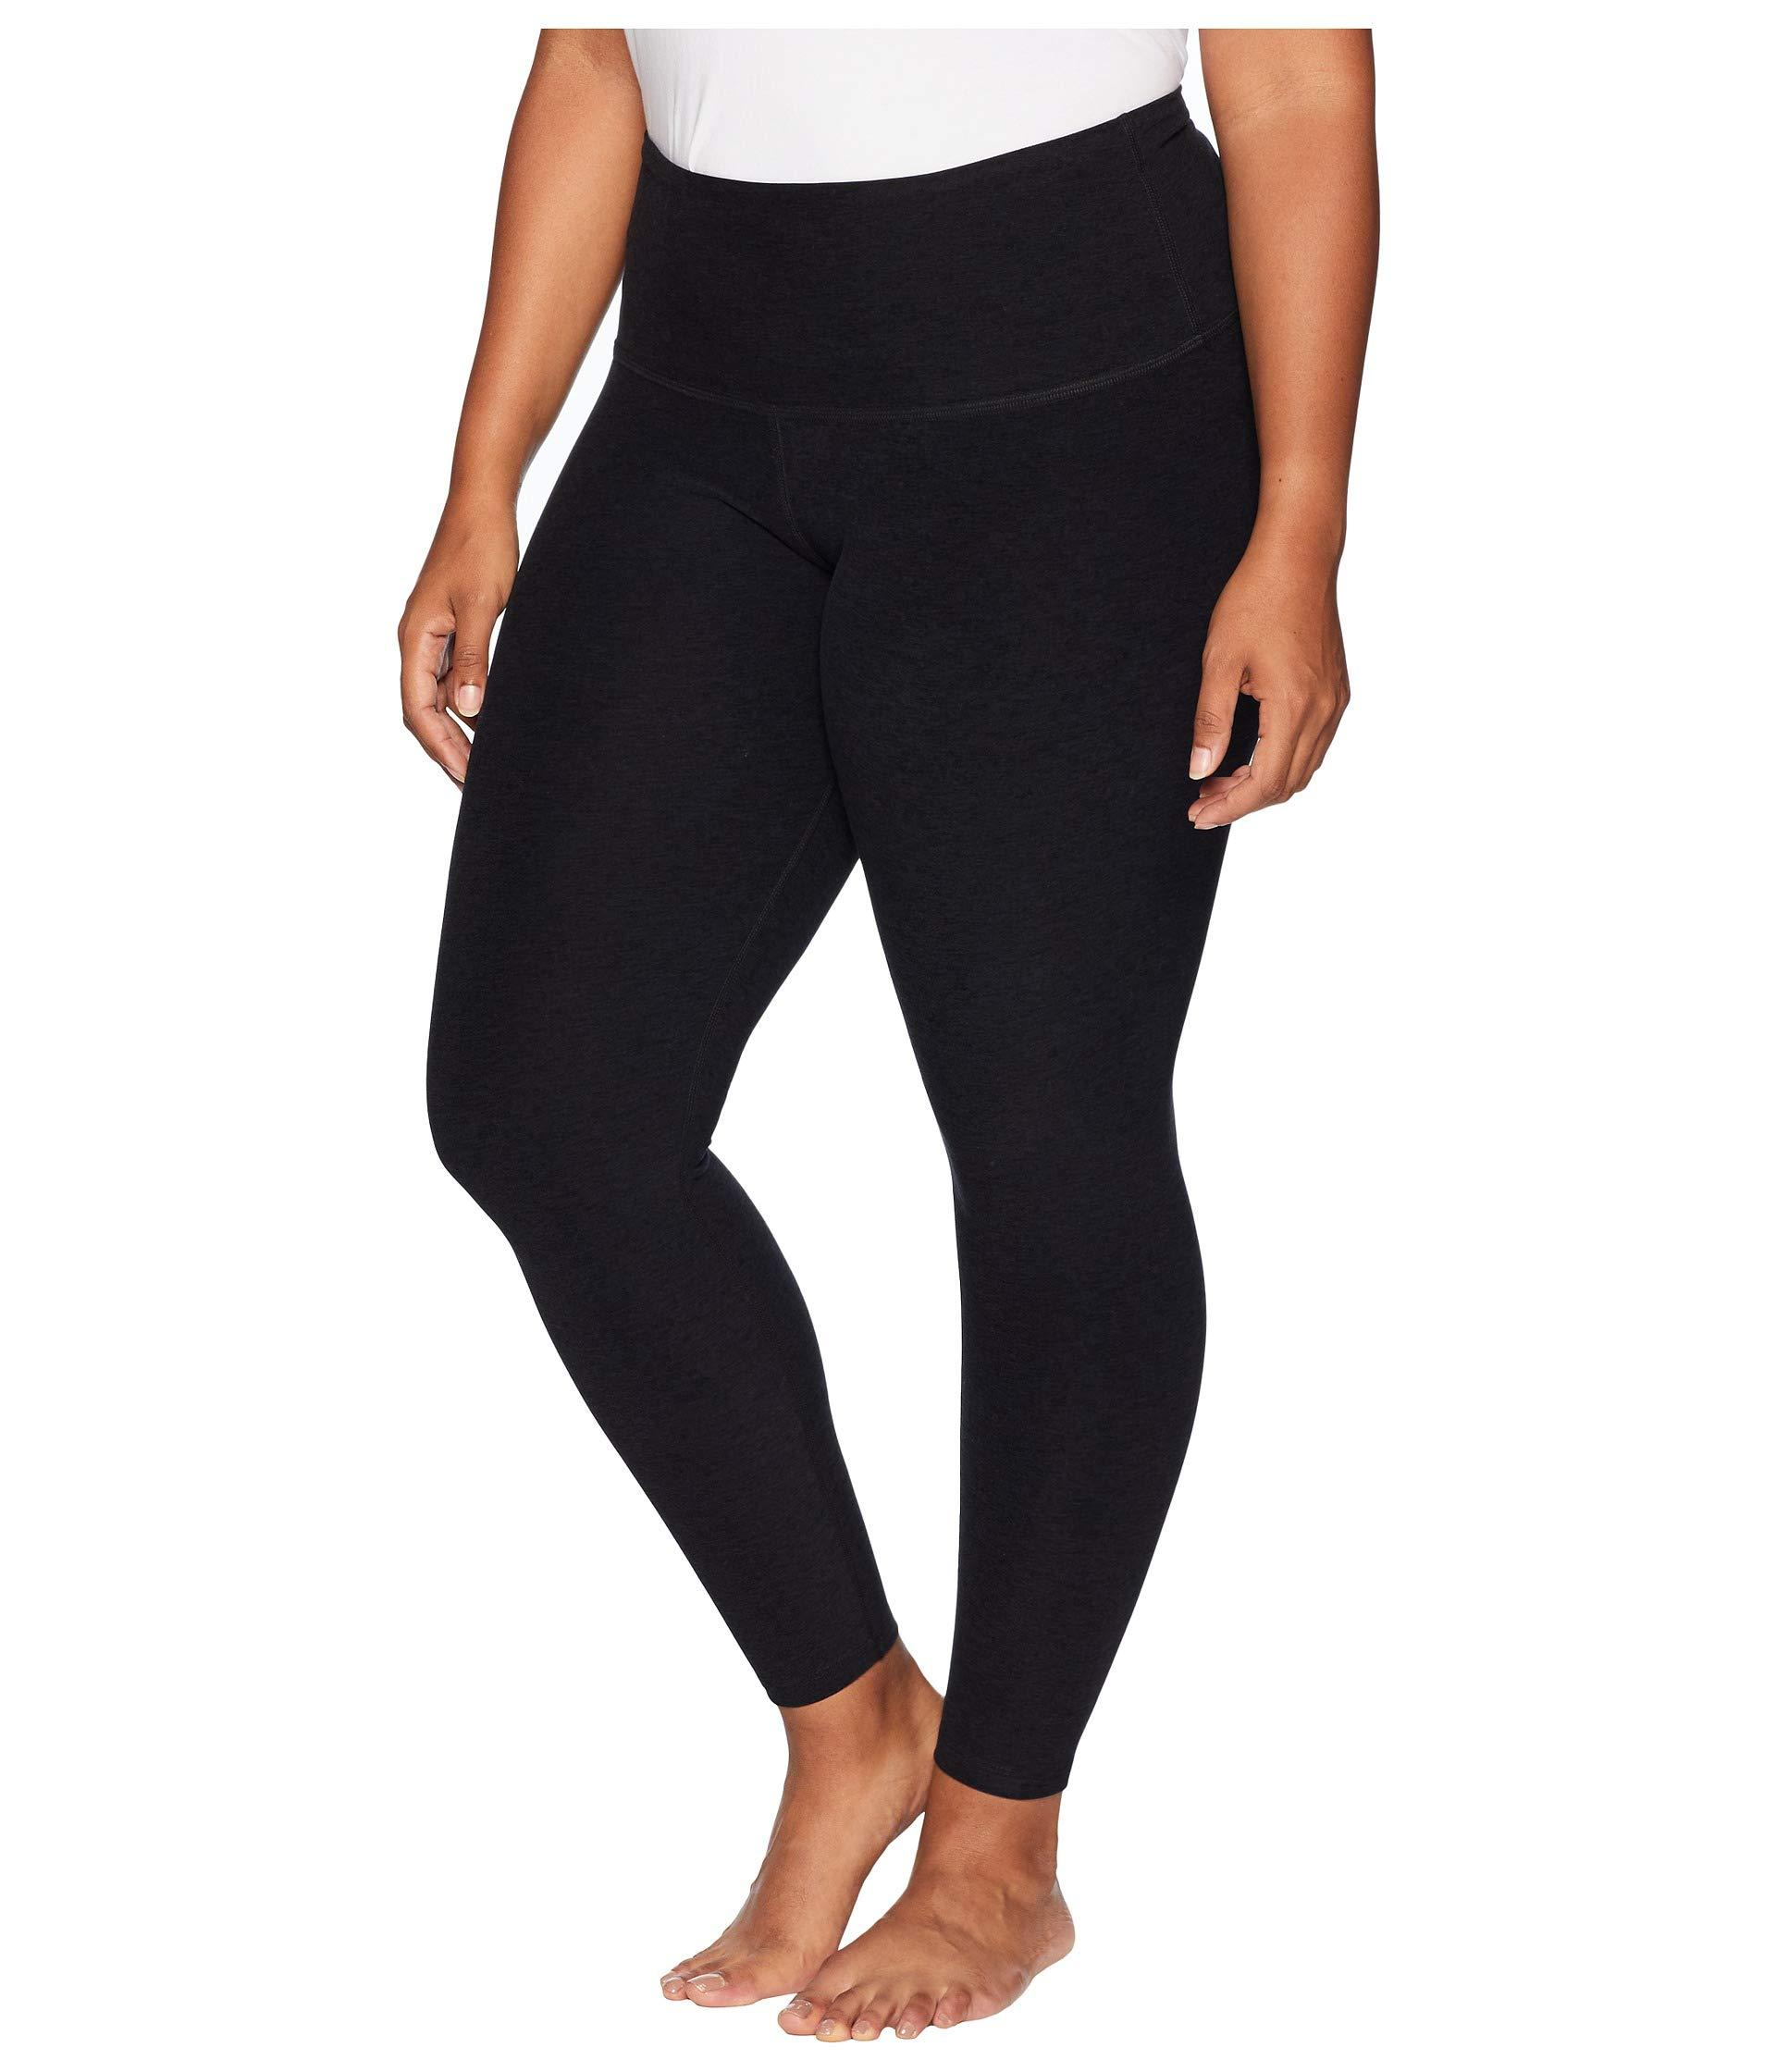 1c33f8785e63f Lyst - Beyond Yoga Plus Size High-waisted Midi Leggings (black/pink/lei)  Women's Workout in Black